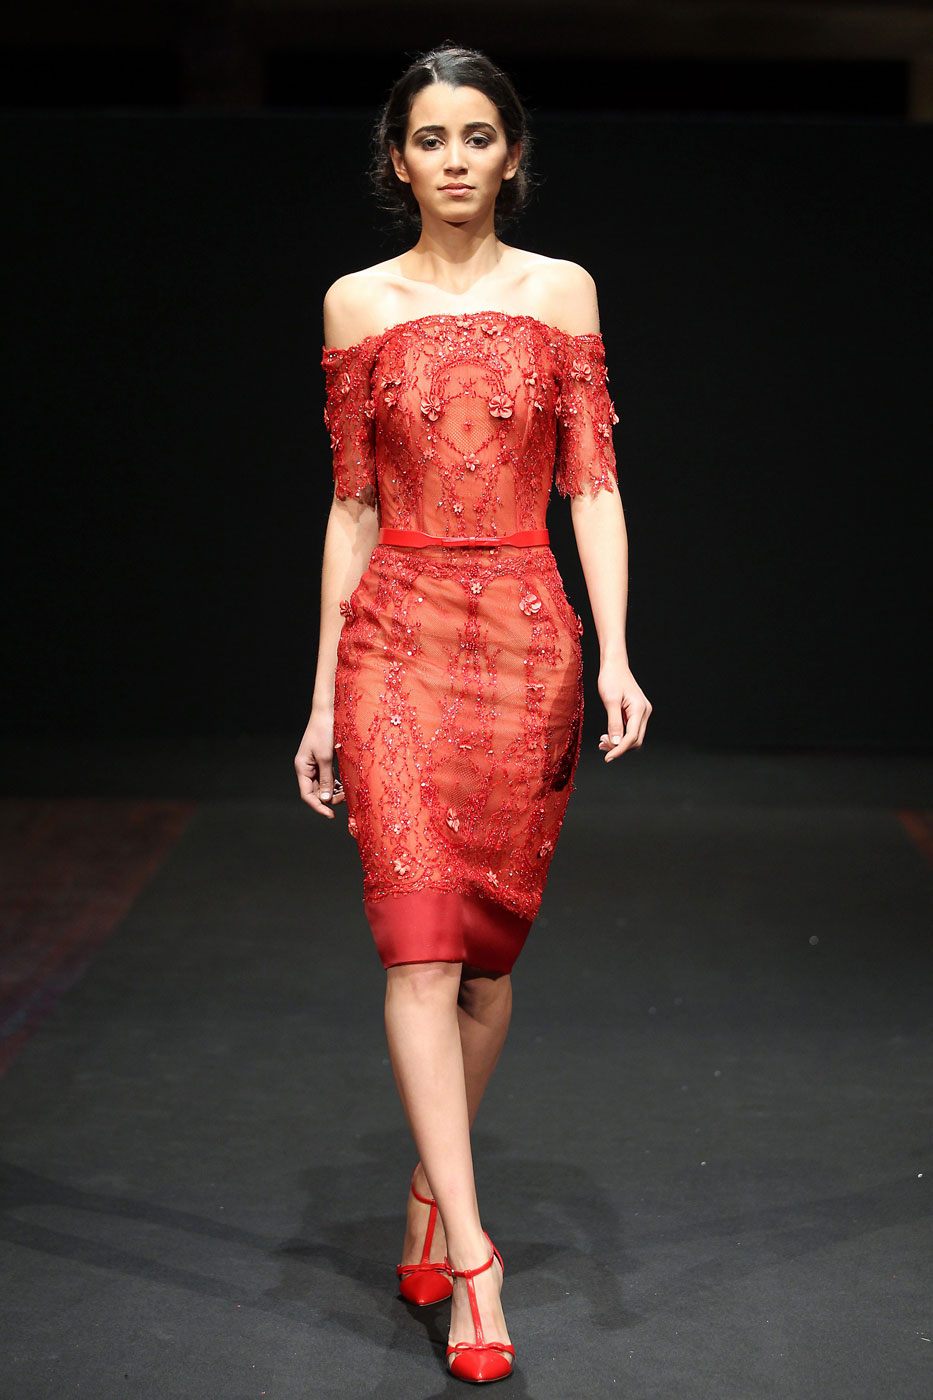 Abed-Mahfouz-fashion-runway-show-haute-couture-paris-spring-2015-the-impression-28